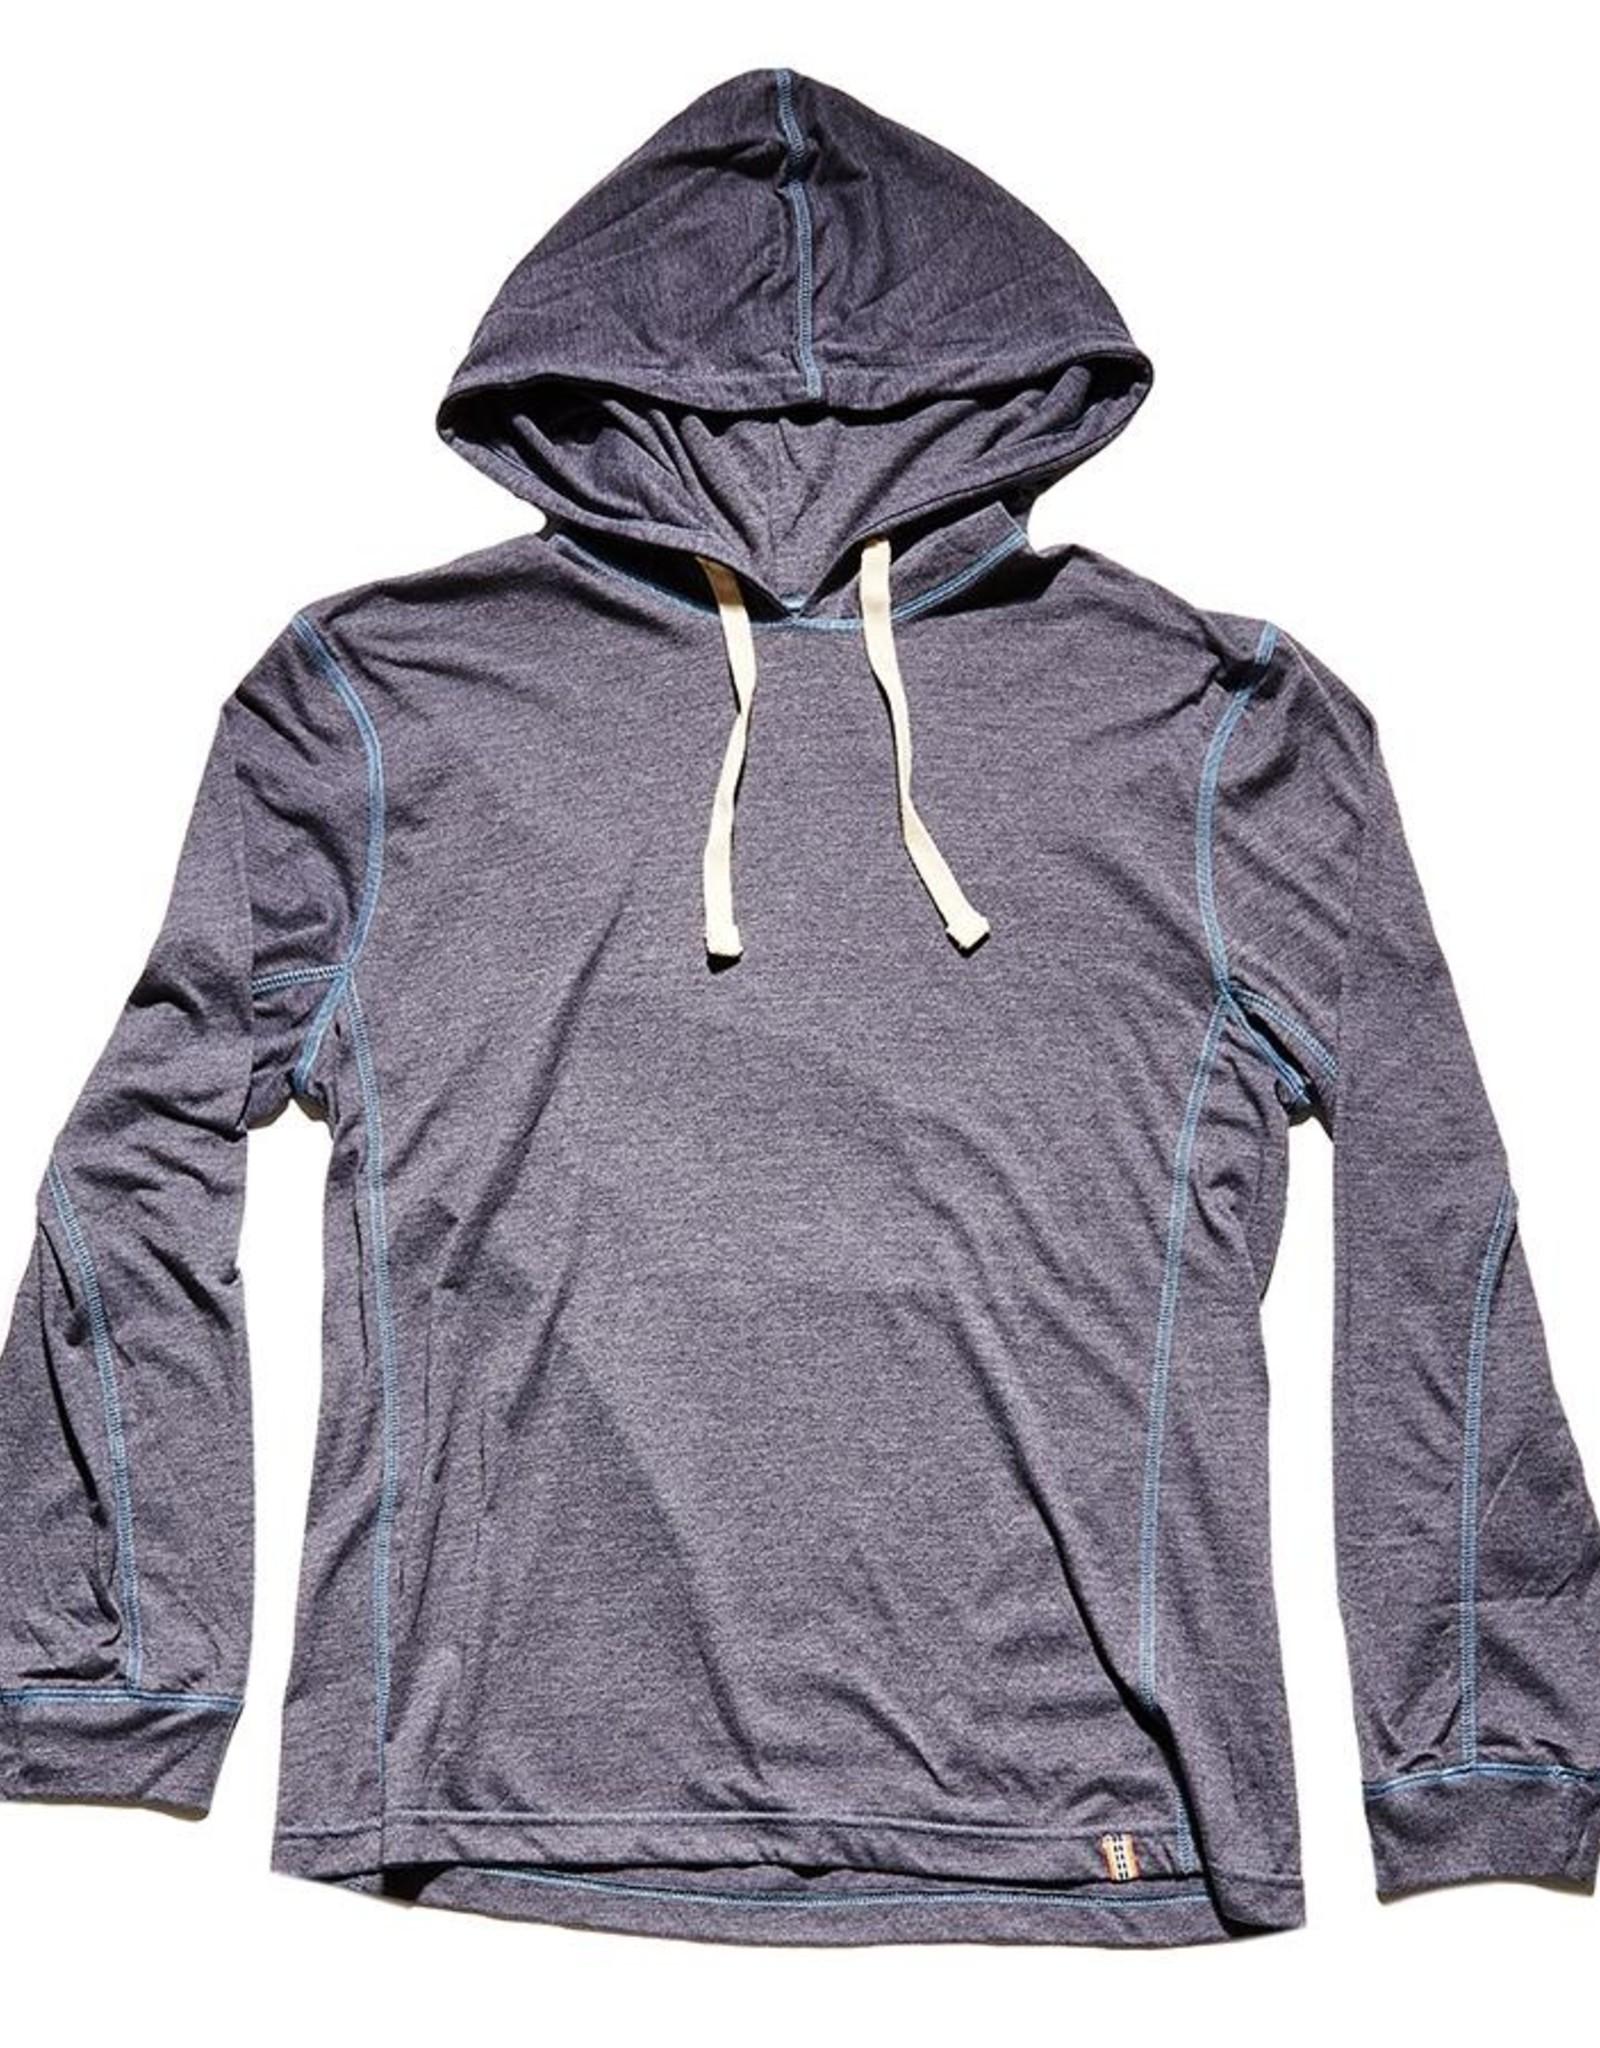 The Normal Brand Hamlin Jersey Hoodie